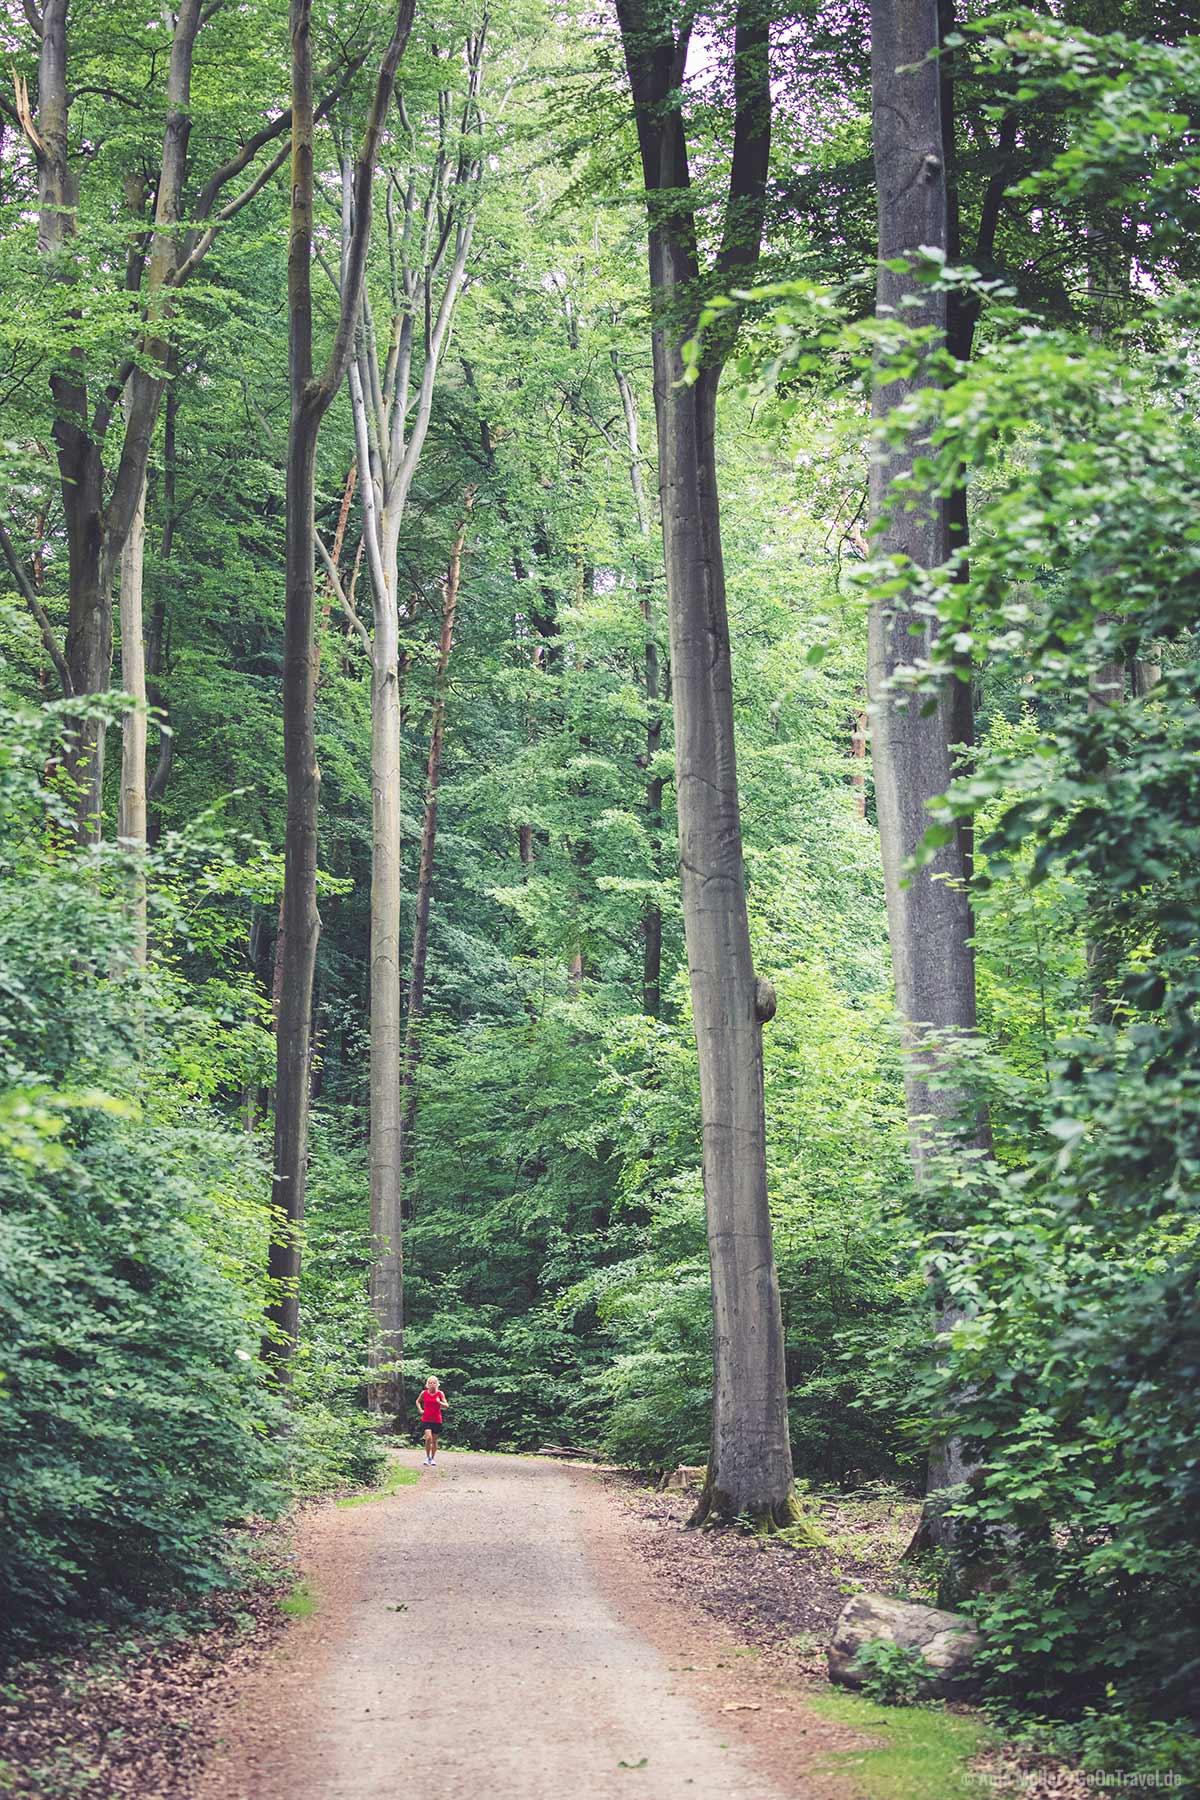 Beliebte Laufstrecke im Tegeler Forst